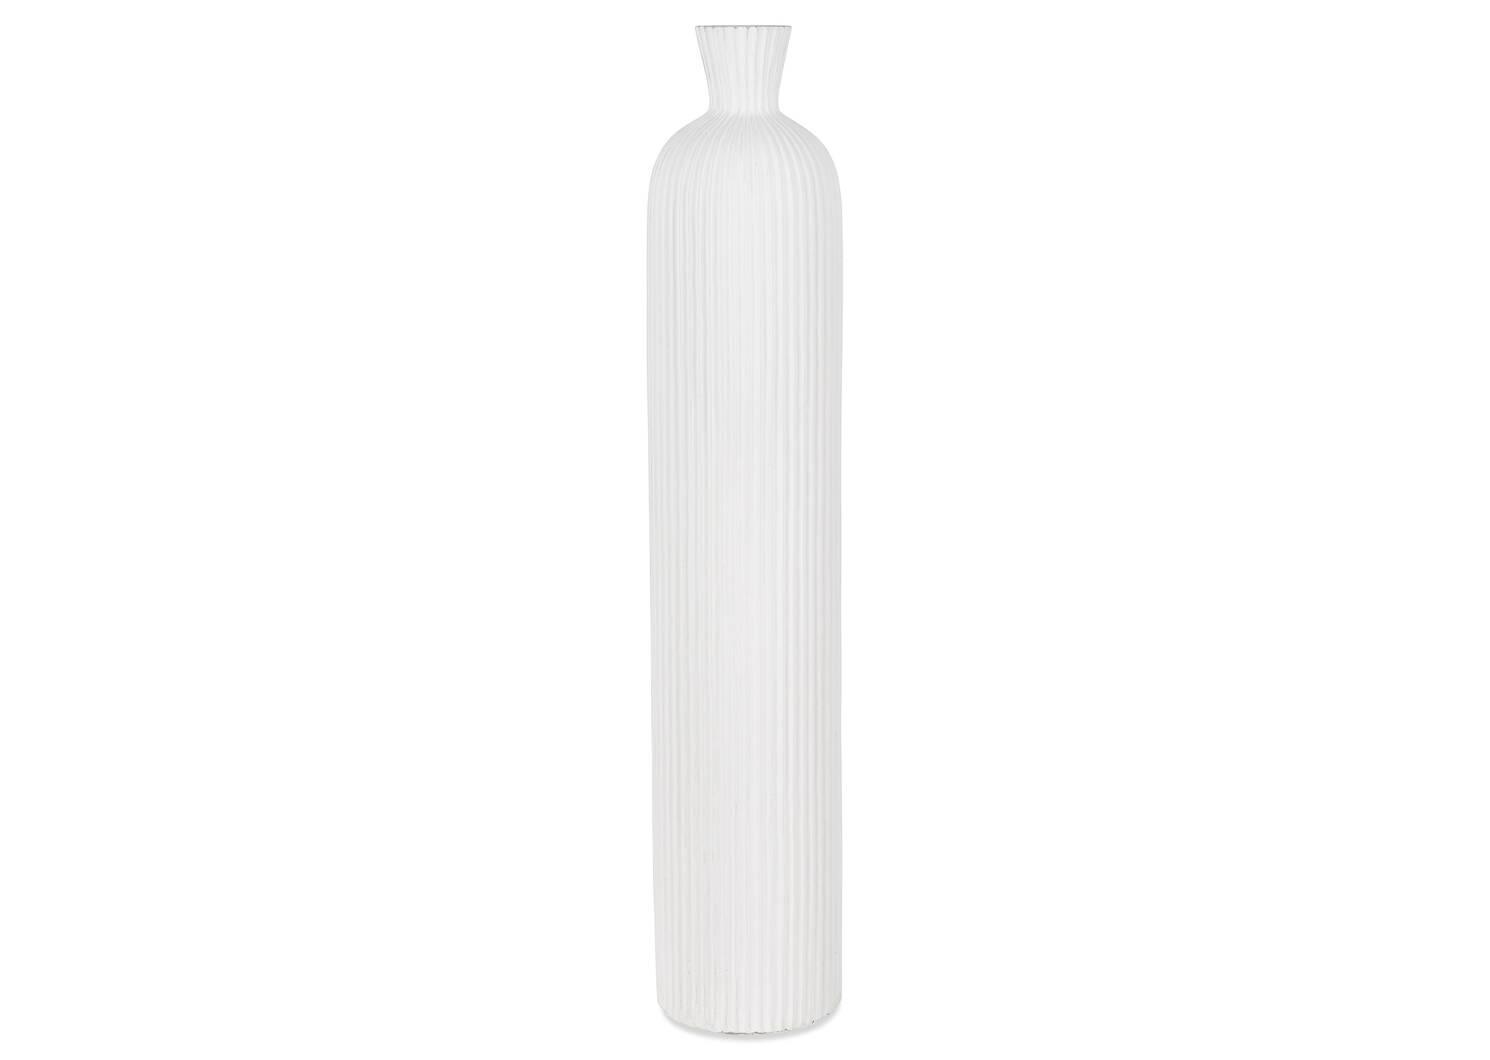 Grand vase Blaire blanc